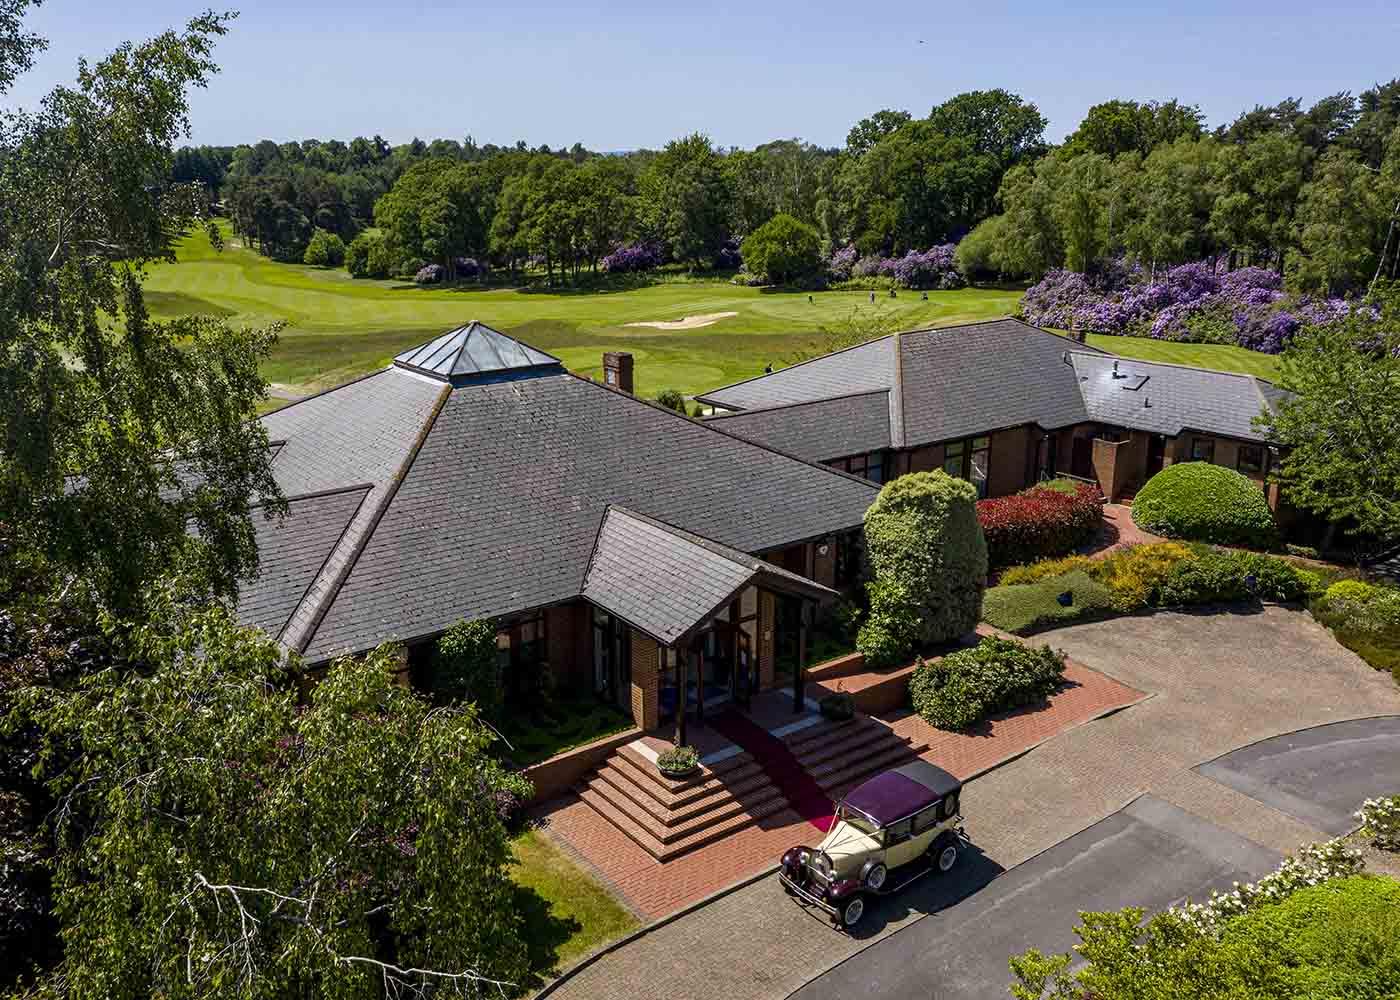 Golf Drone Photography Wokingham